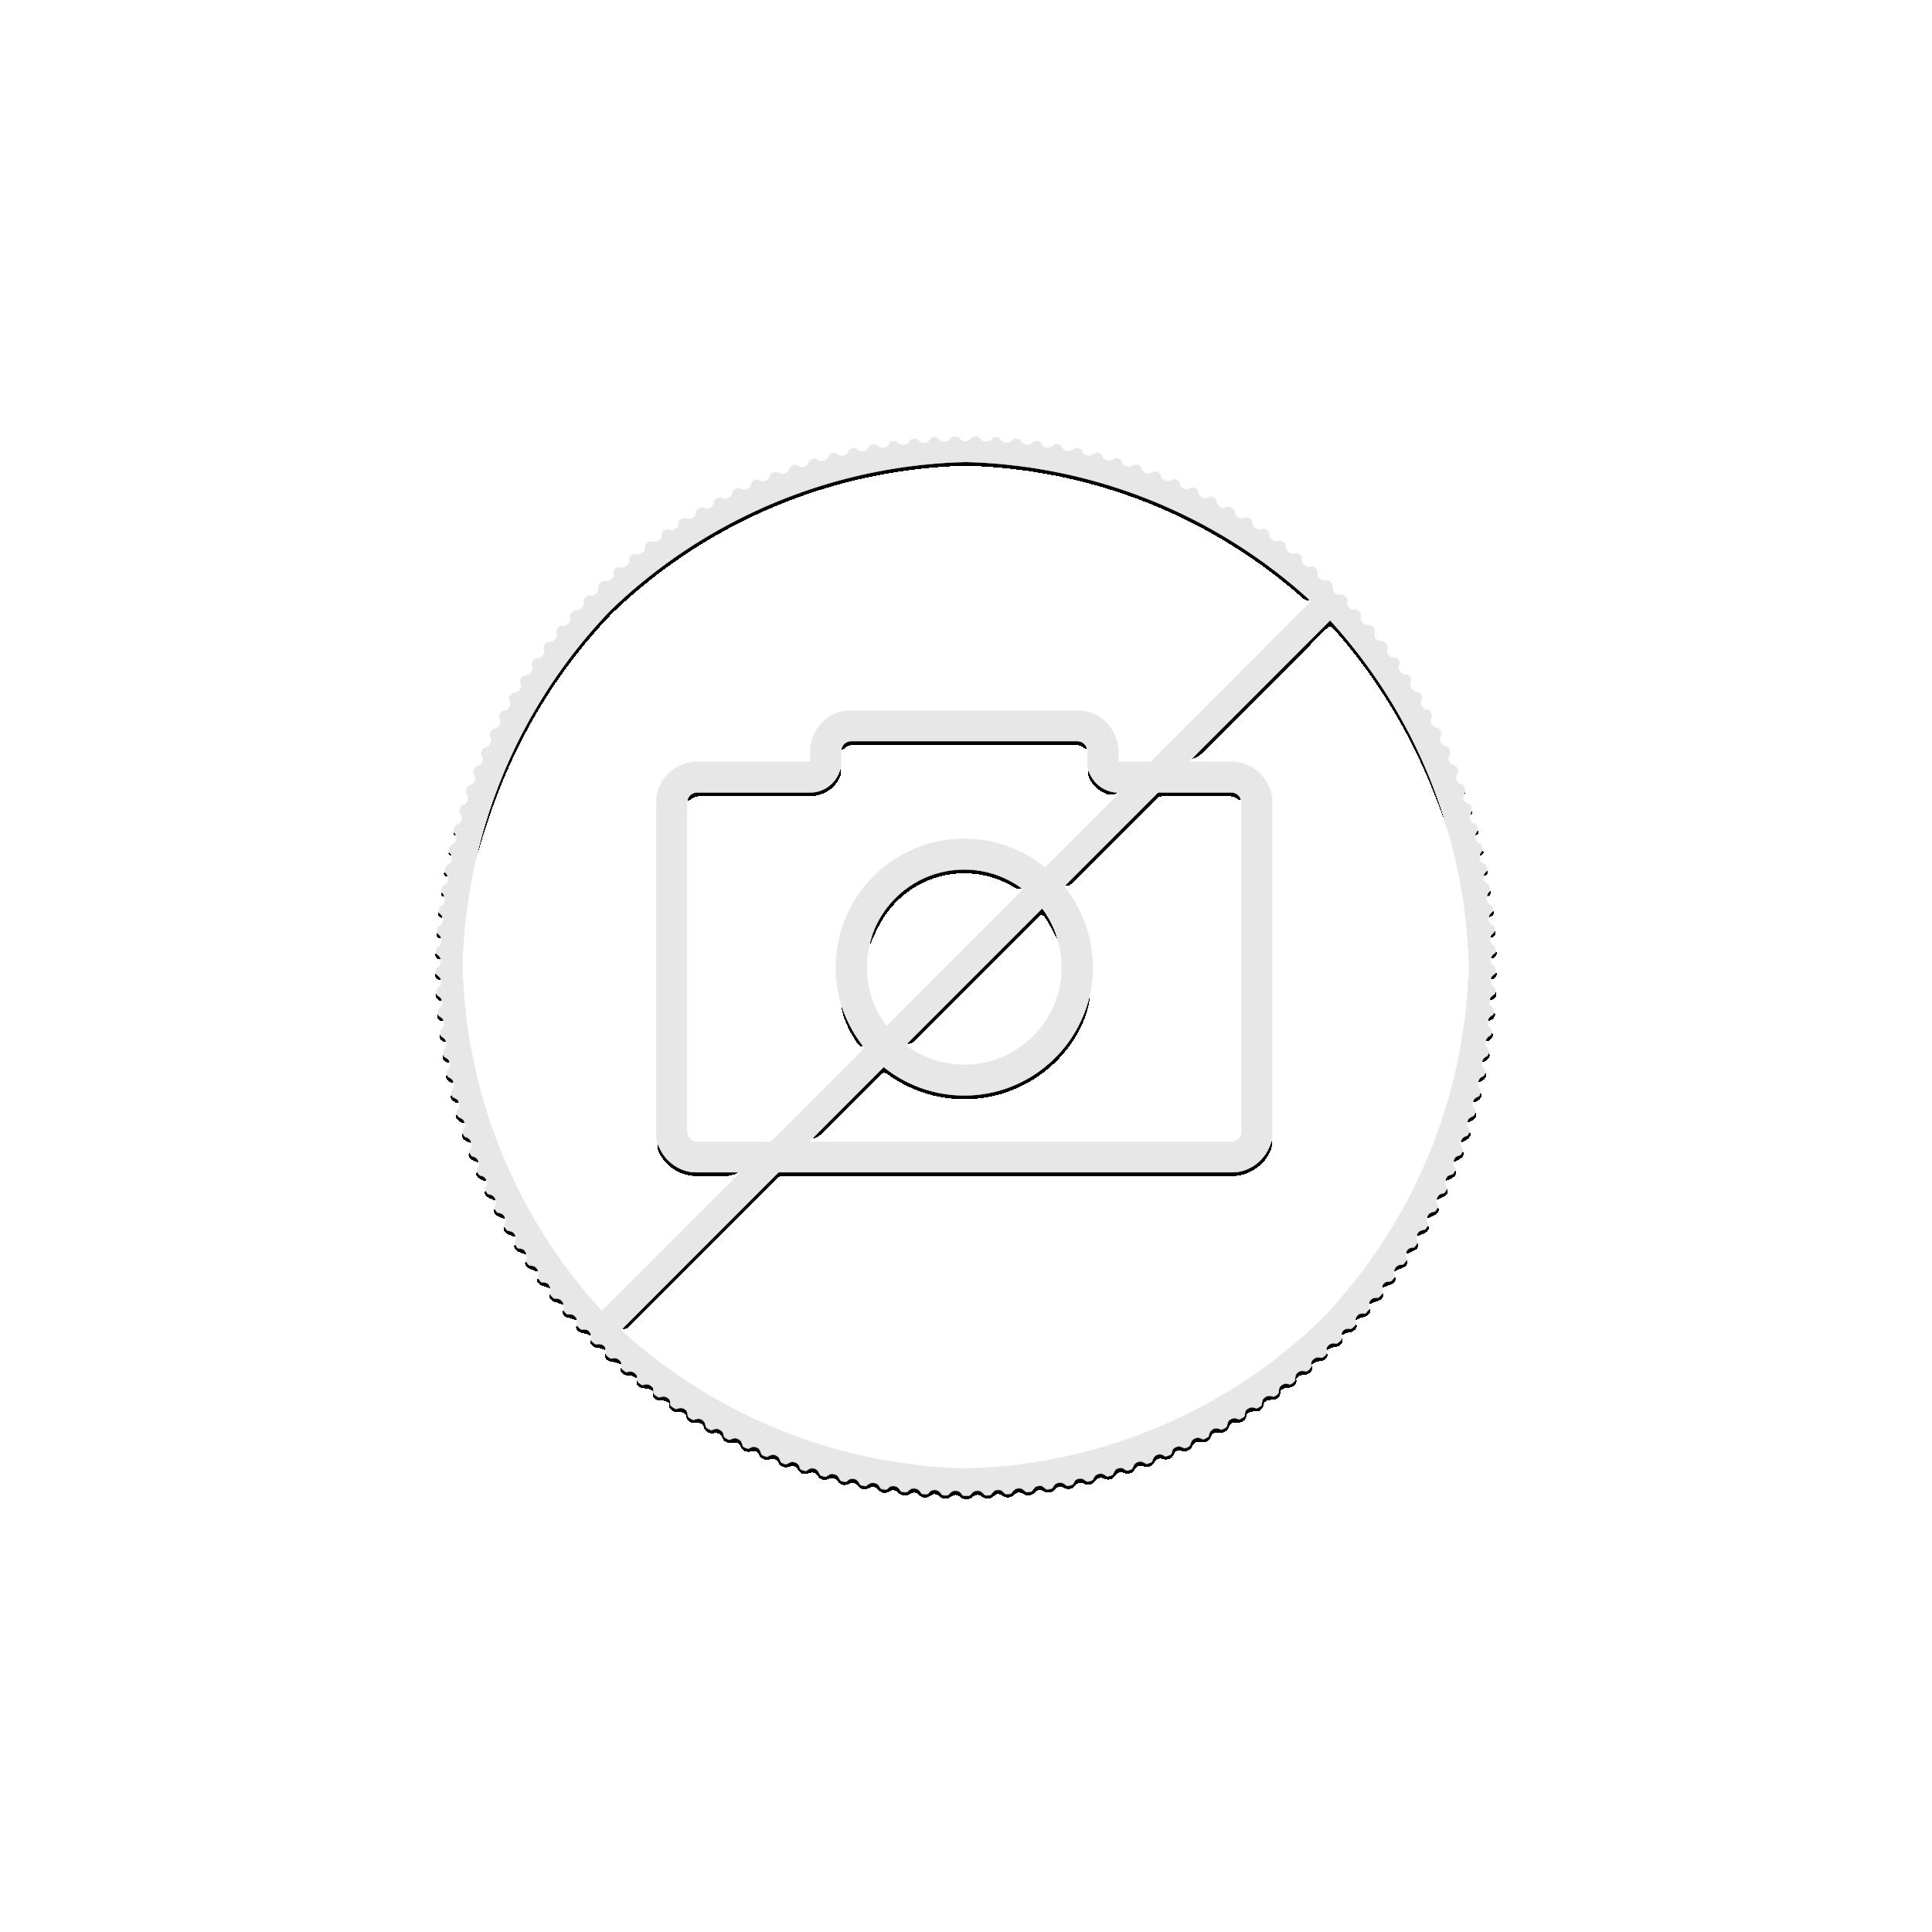 1 Troy ounce zilveren munt Glowing Galaxy Kangaroo 2019